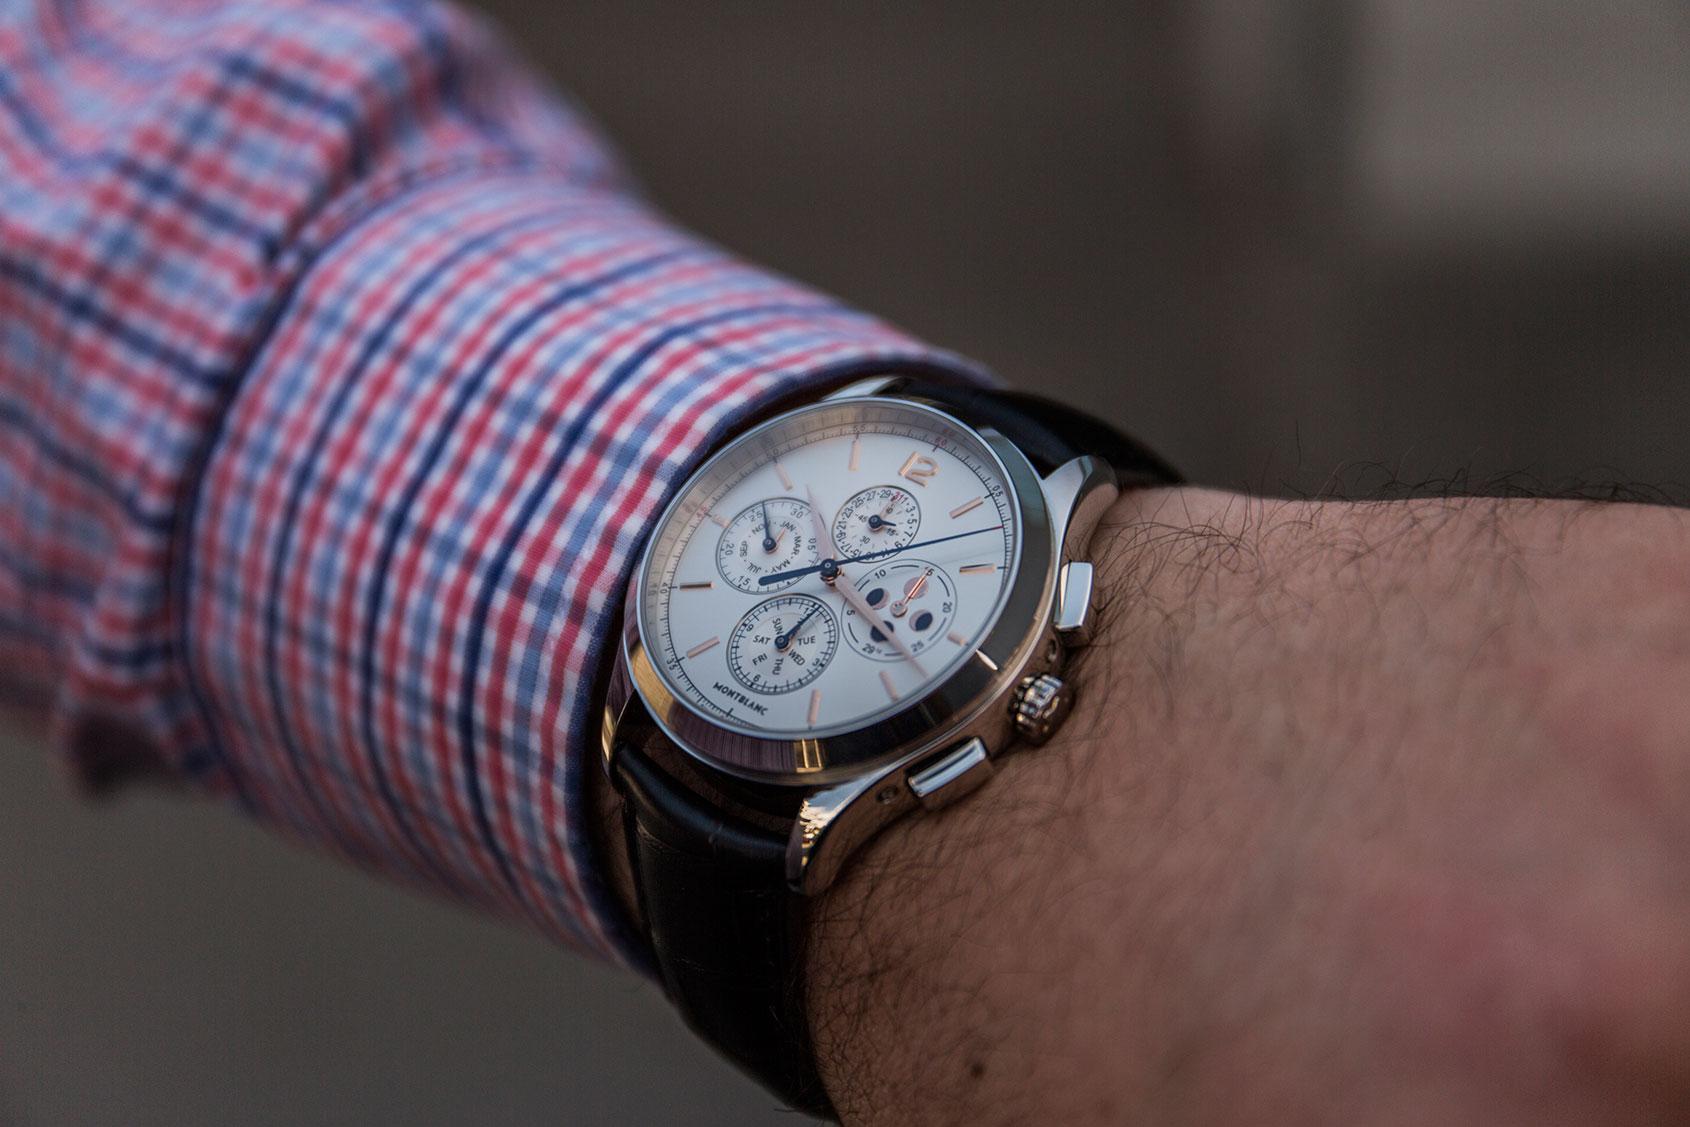 montblanc-heritage-chronometrie-annual-calendar-chronograph-10